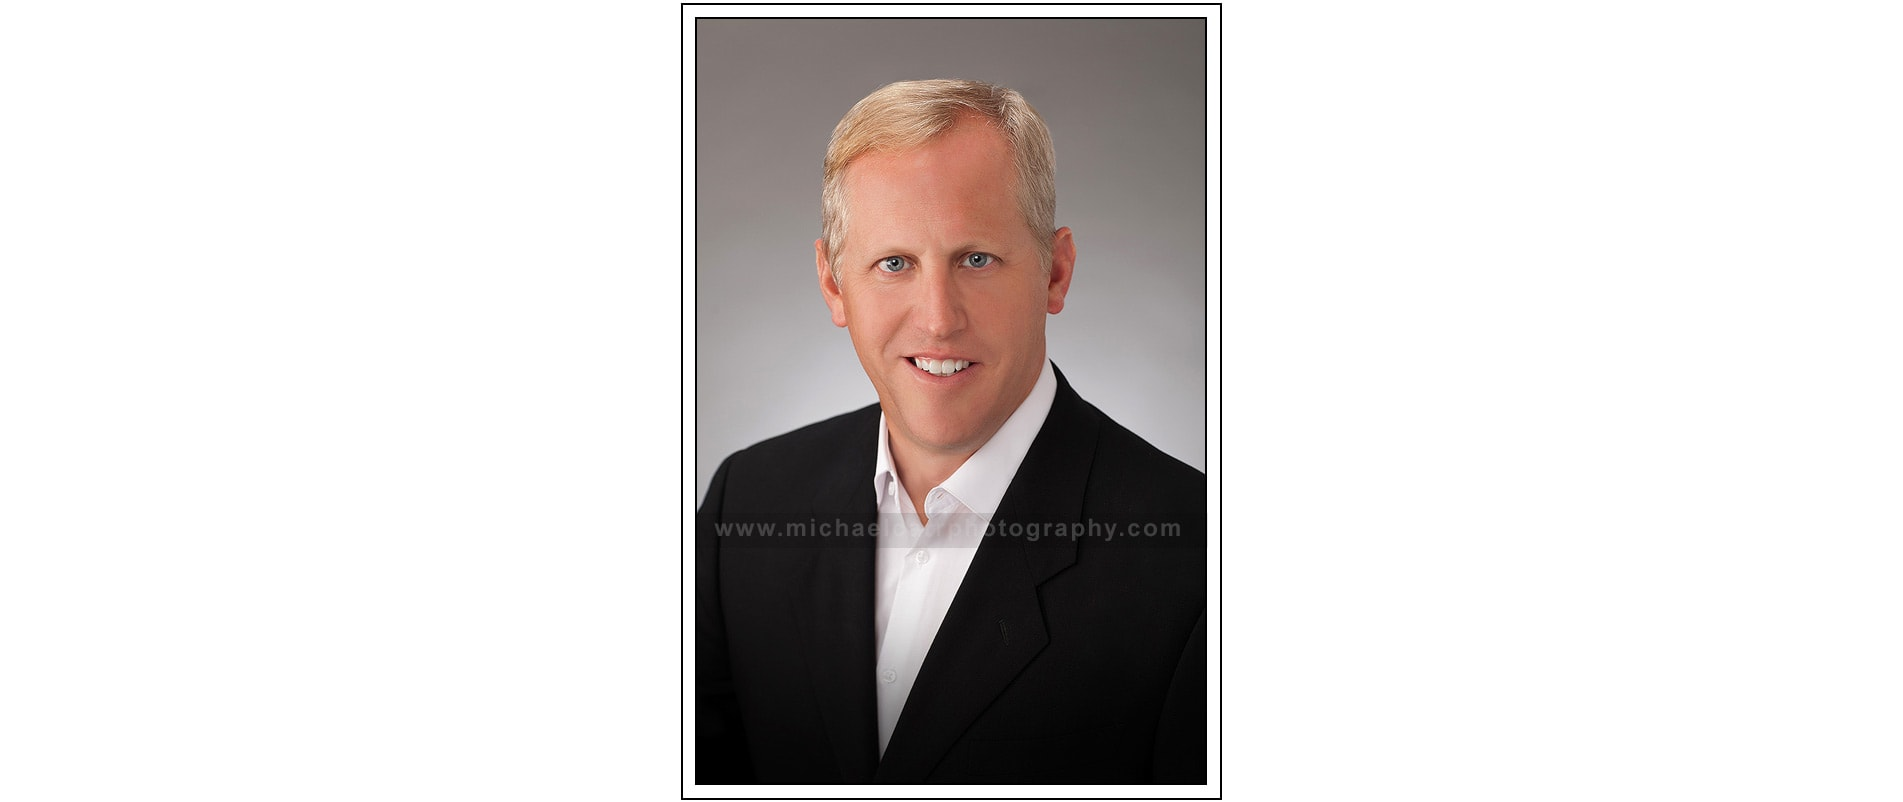 Casual Business Headshot Portraits